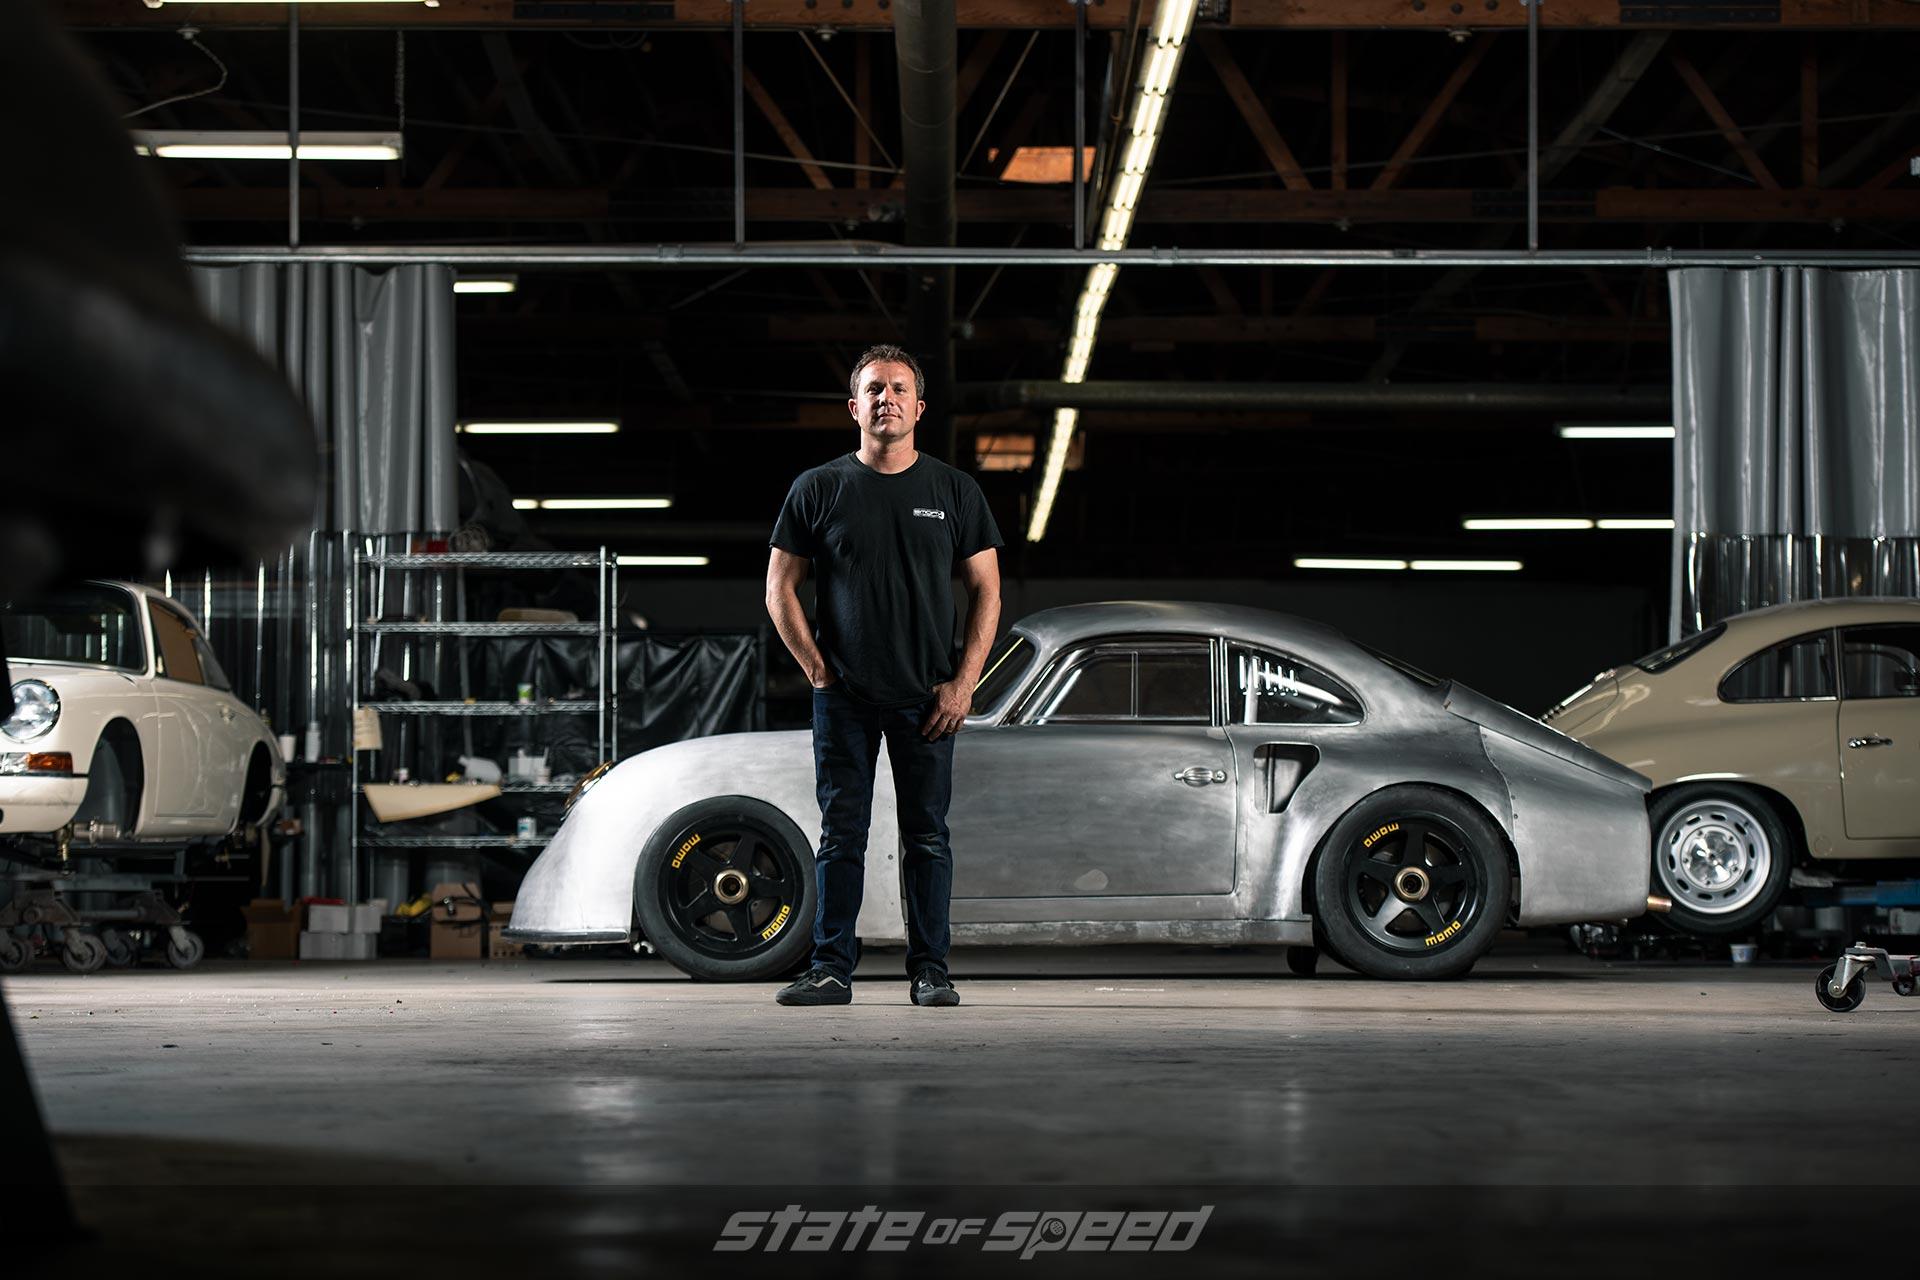 Rod Emory in front of a Cisneros' Porsche